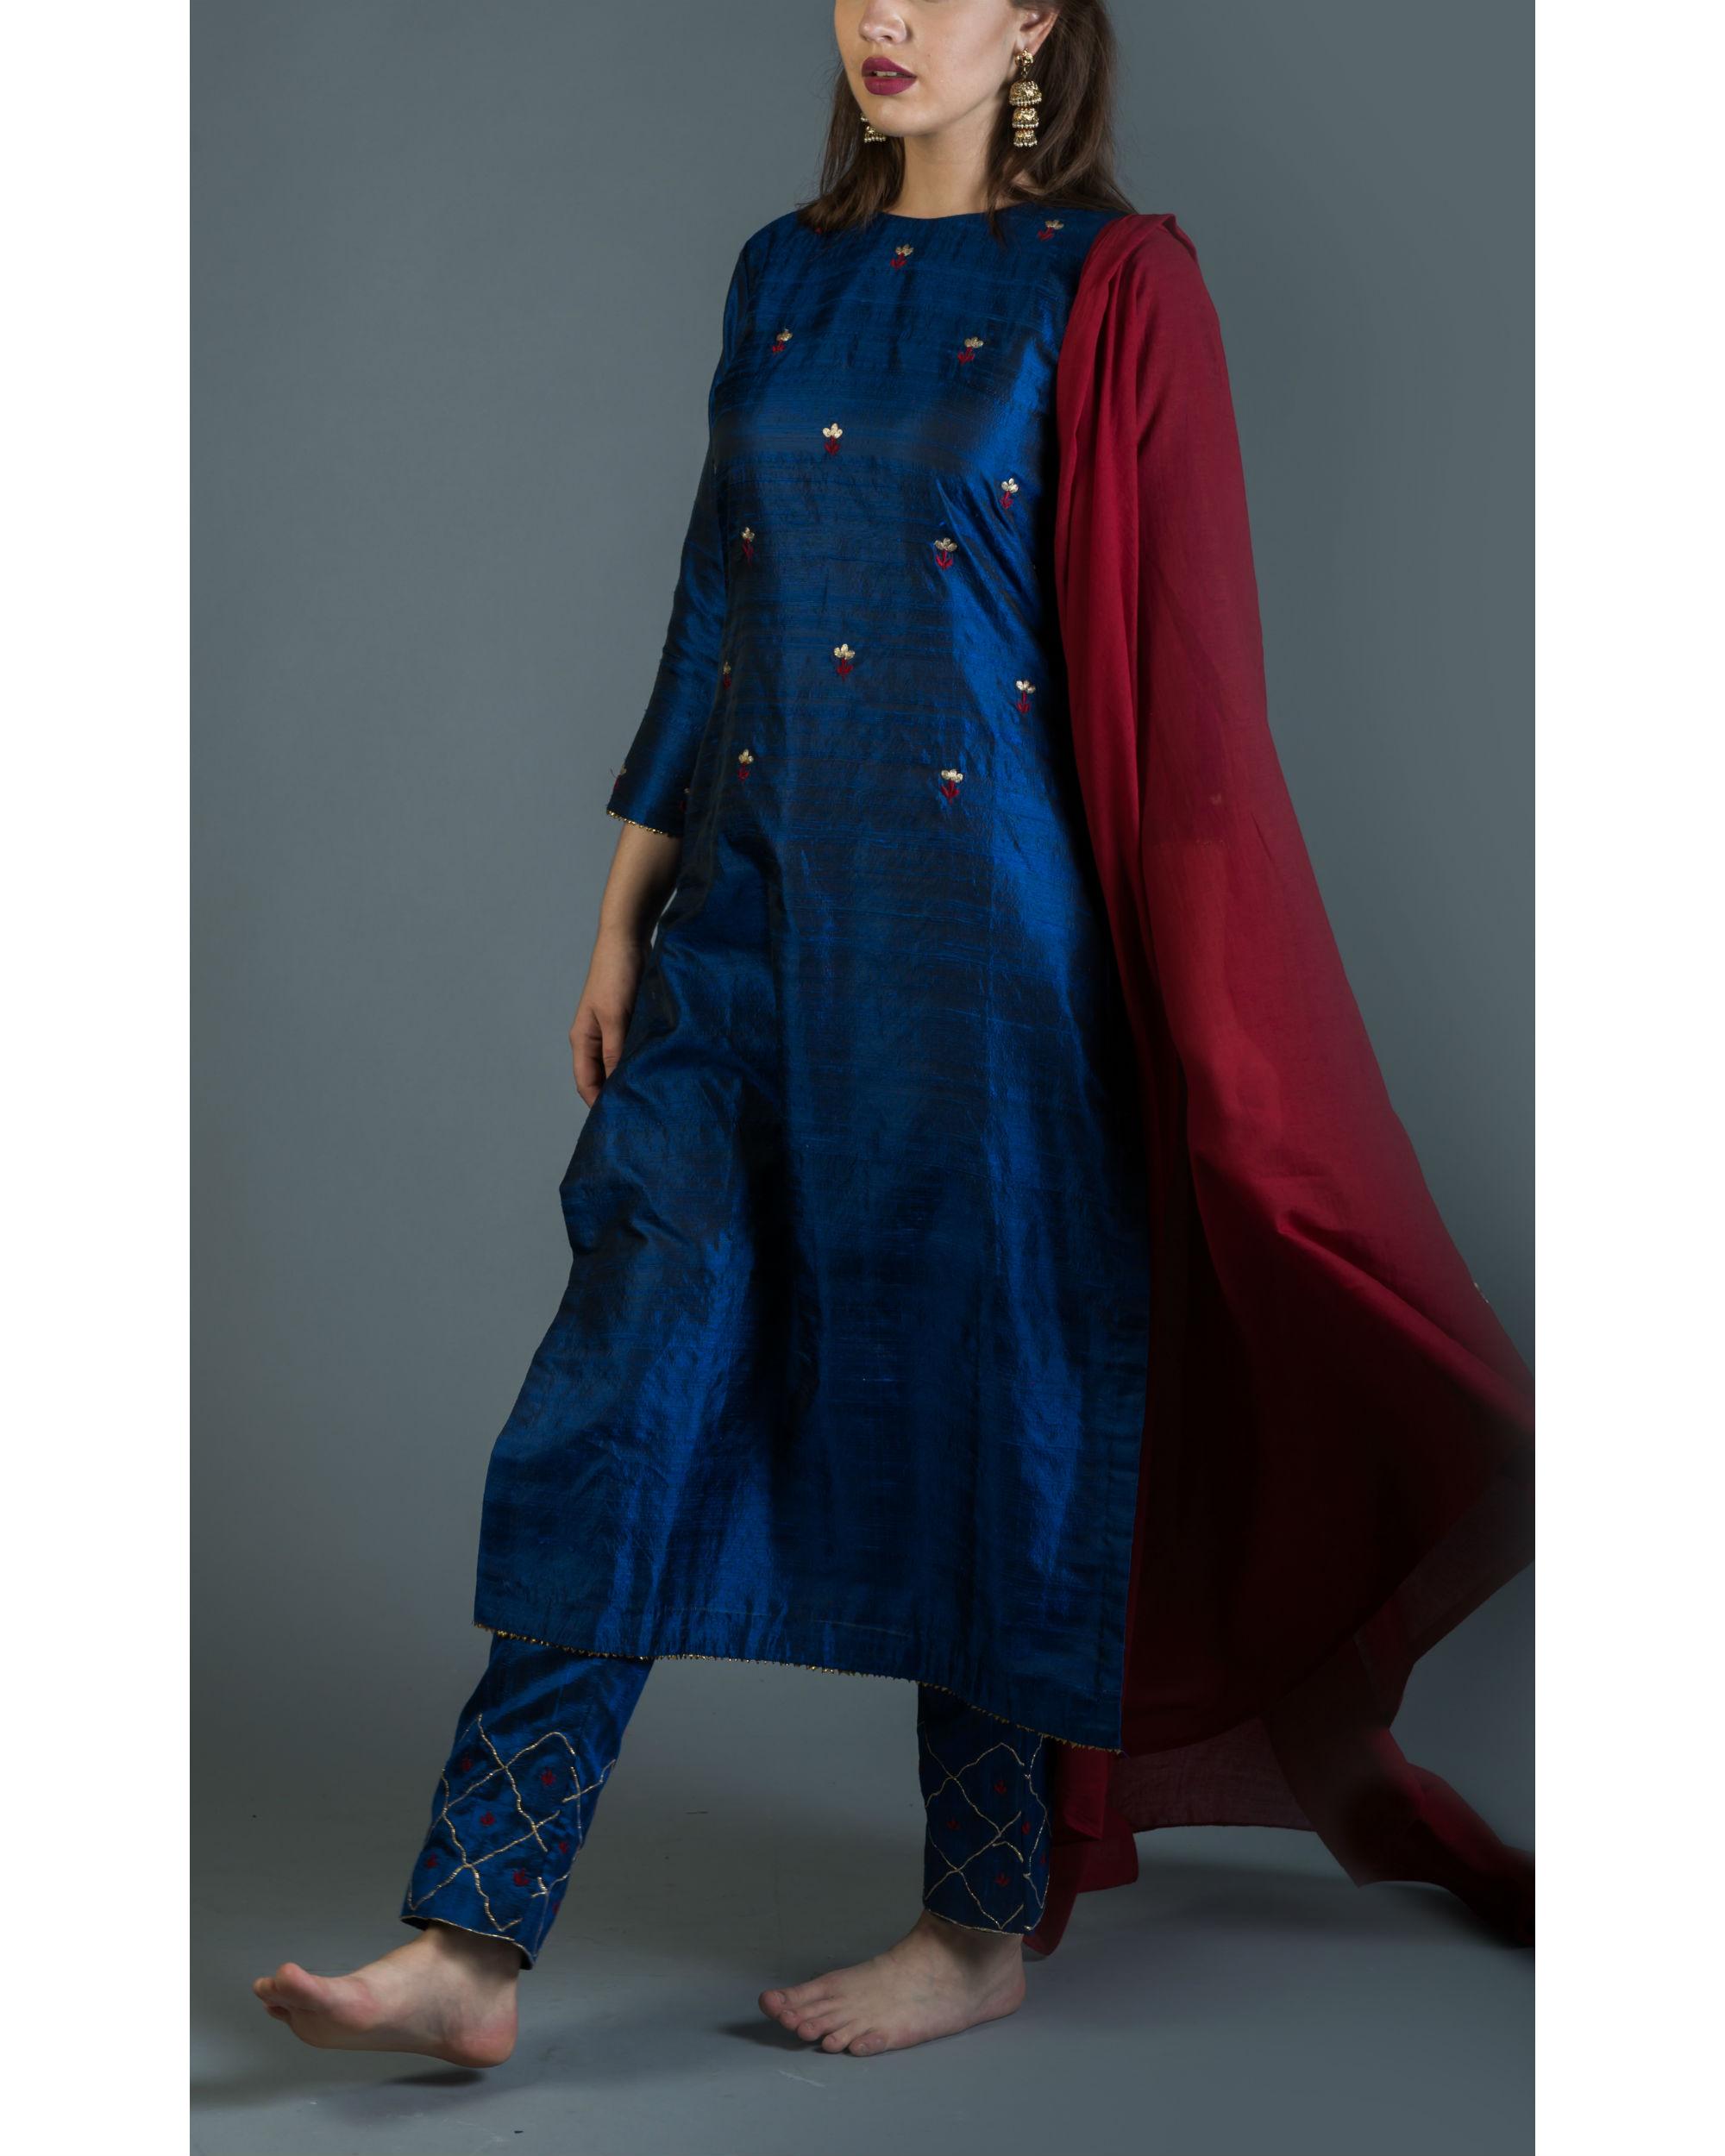 Sapphire embroidered kurta set with maroon dupatta